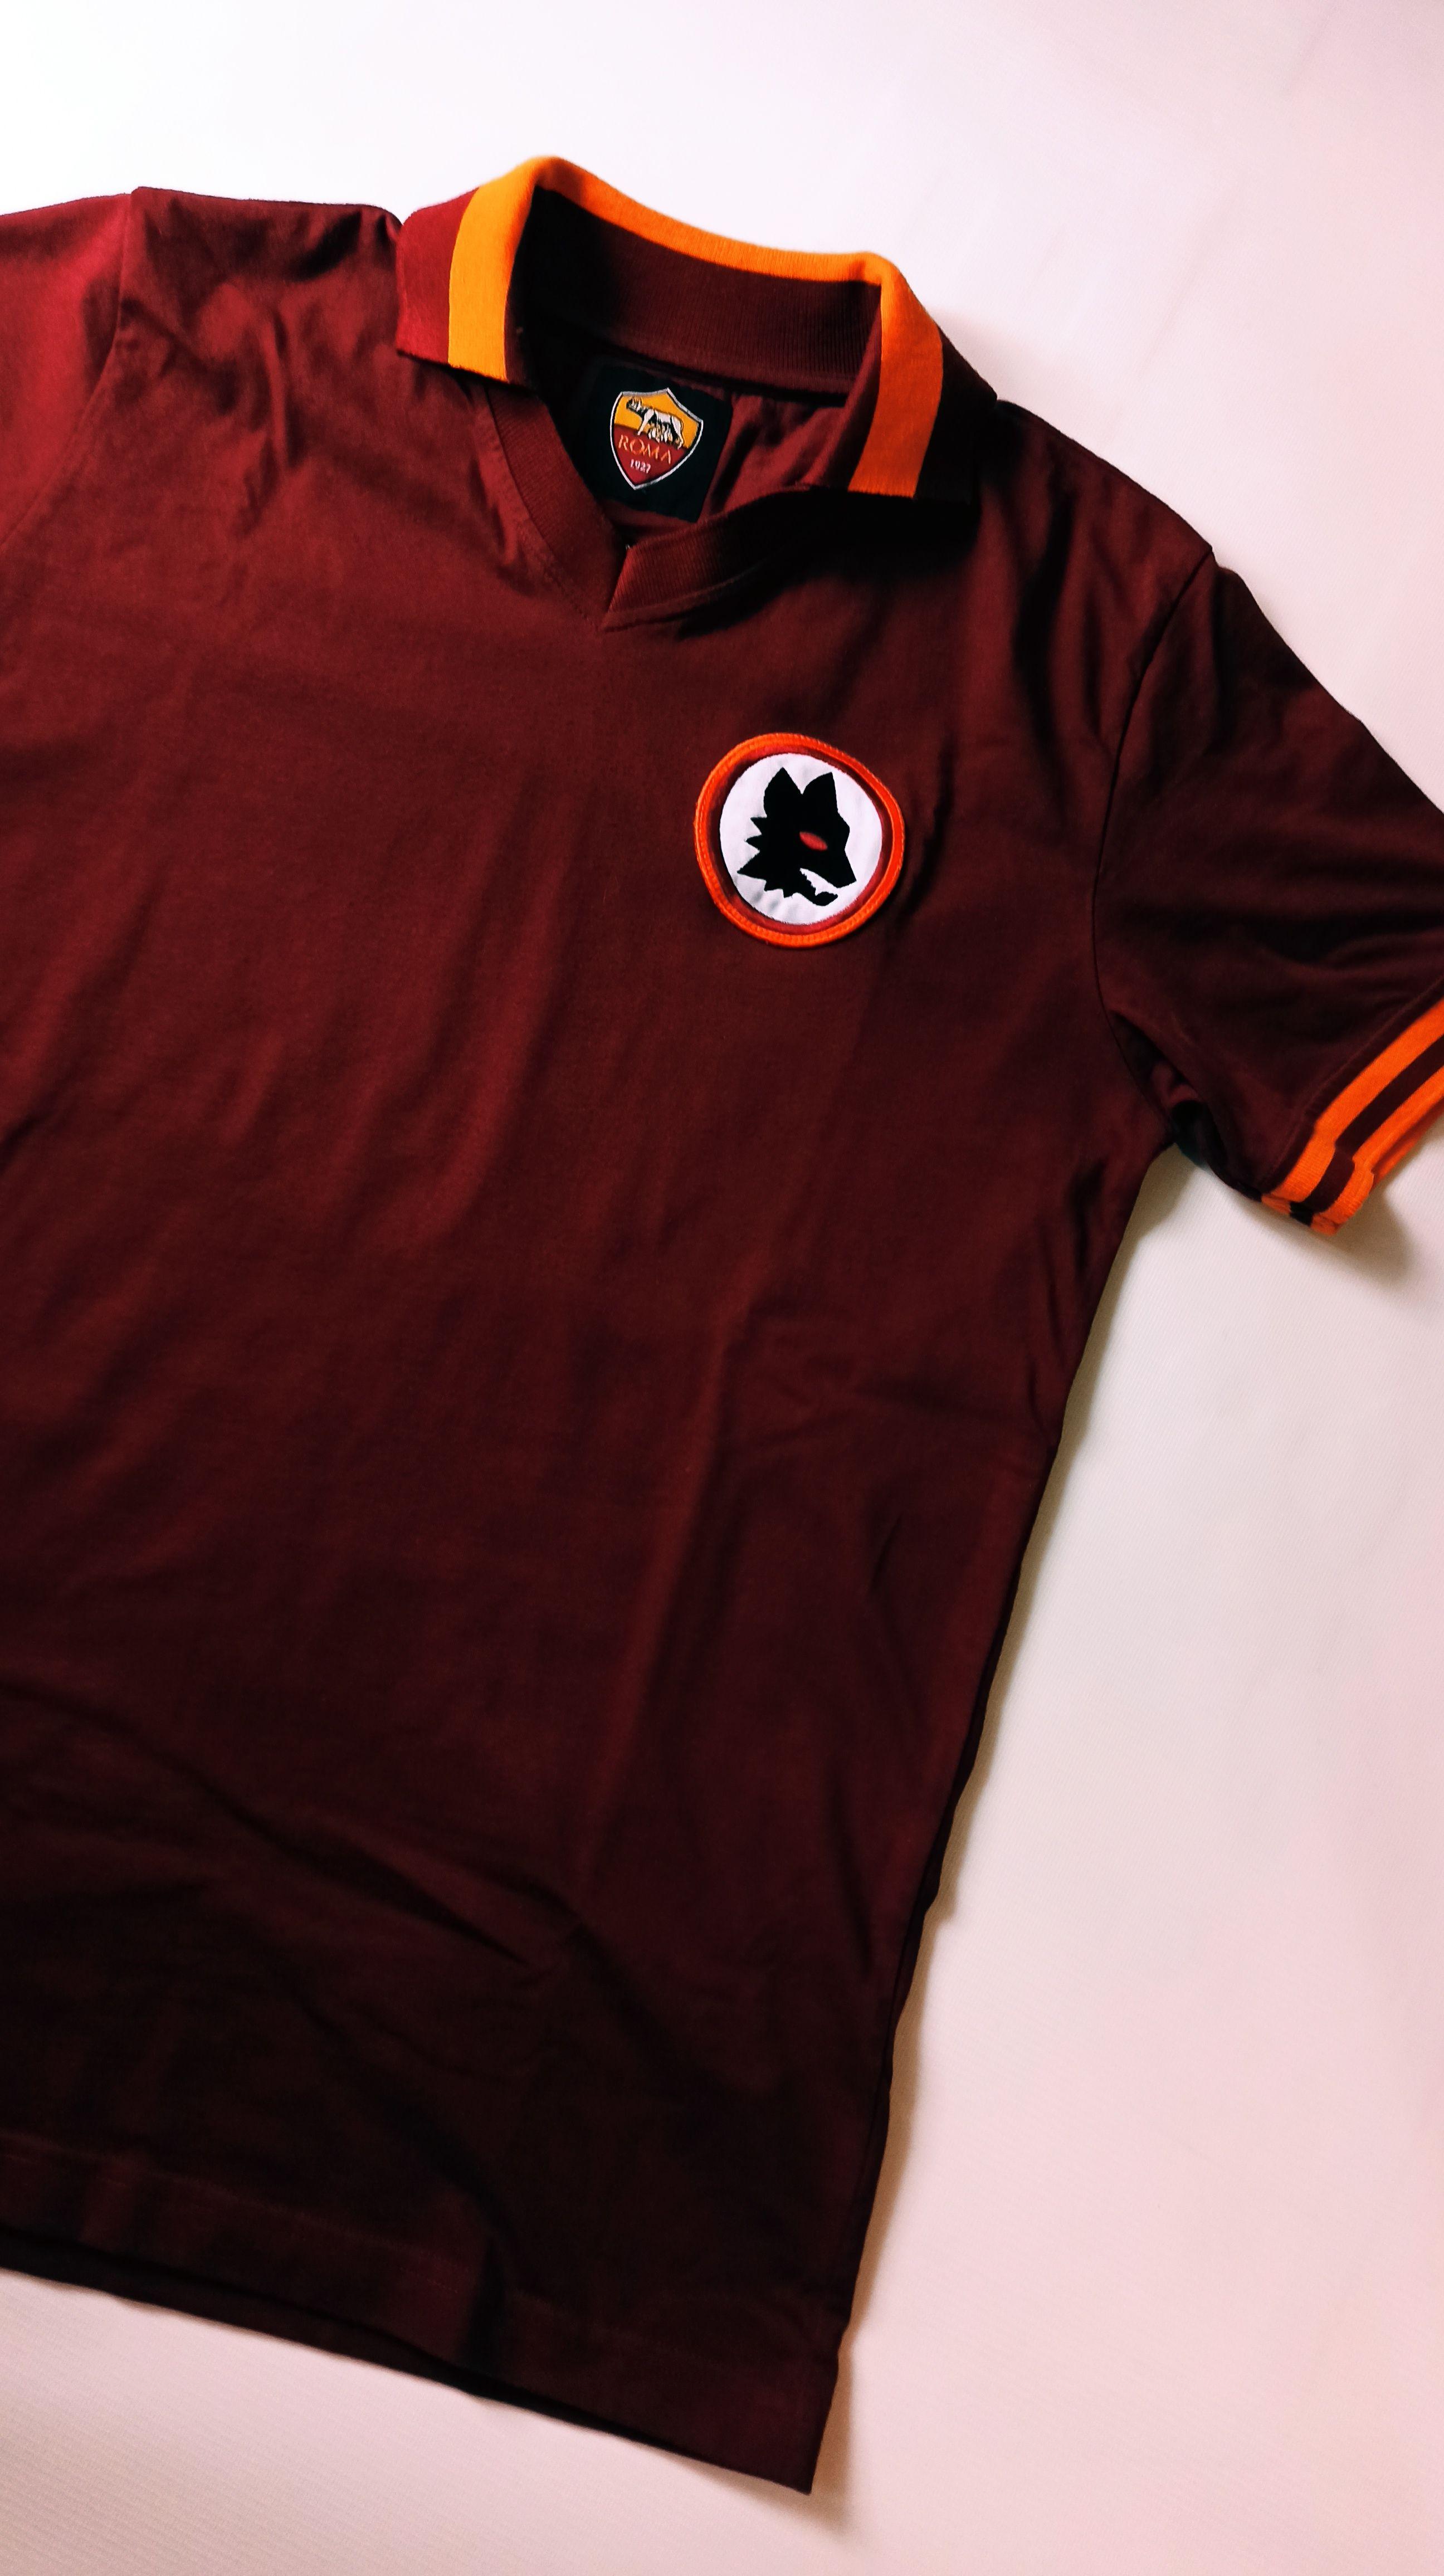 As Roma 1978 1979 Replica Home Football Shirt Soccer Jersey Maglia Calcio Italy Ebay In 2020 Vintage Football Shirts Football Shirts Vintage Football